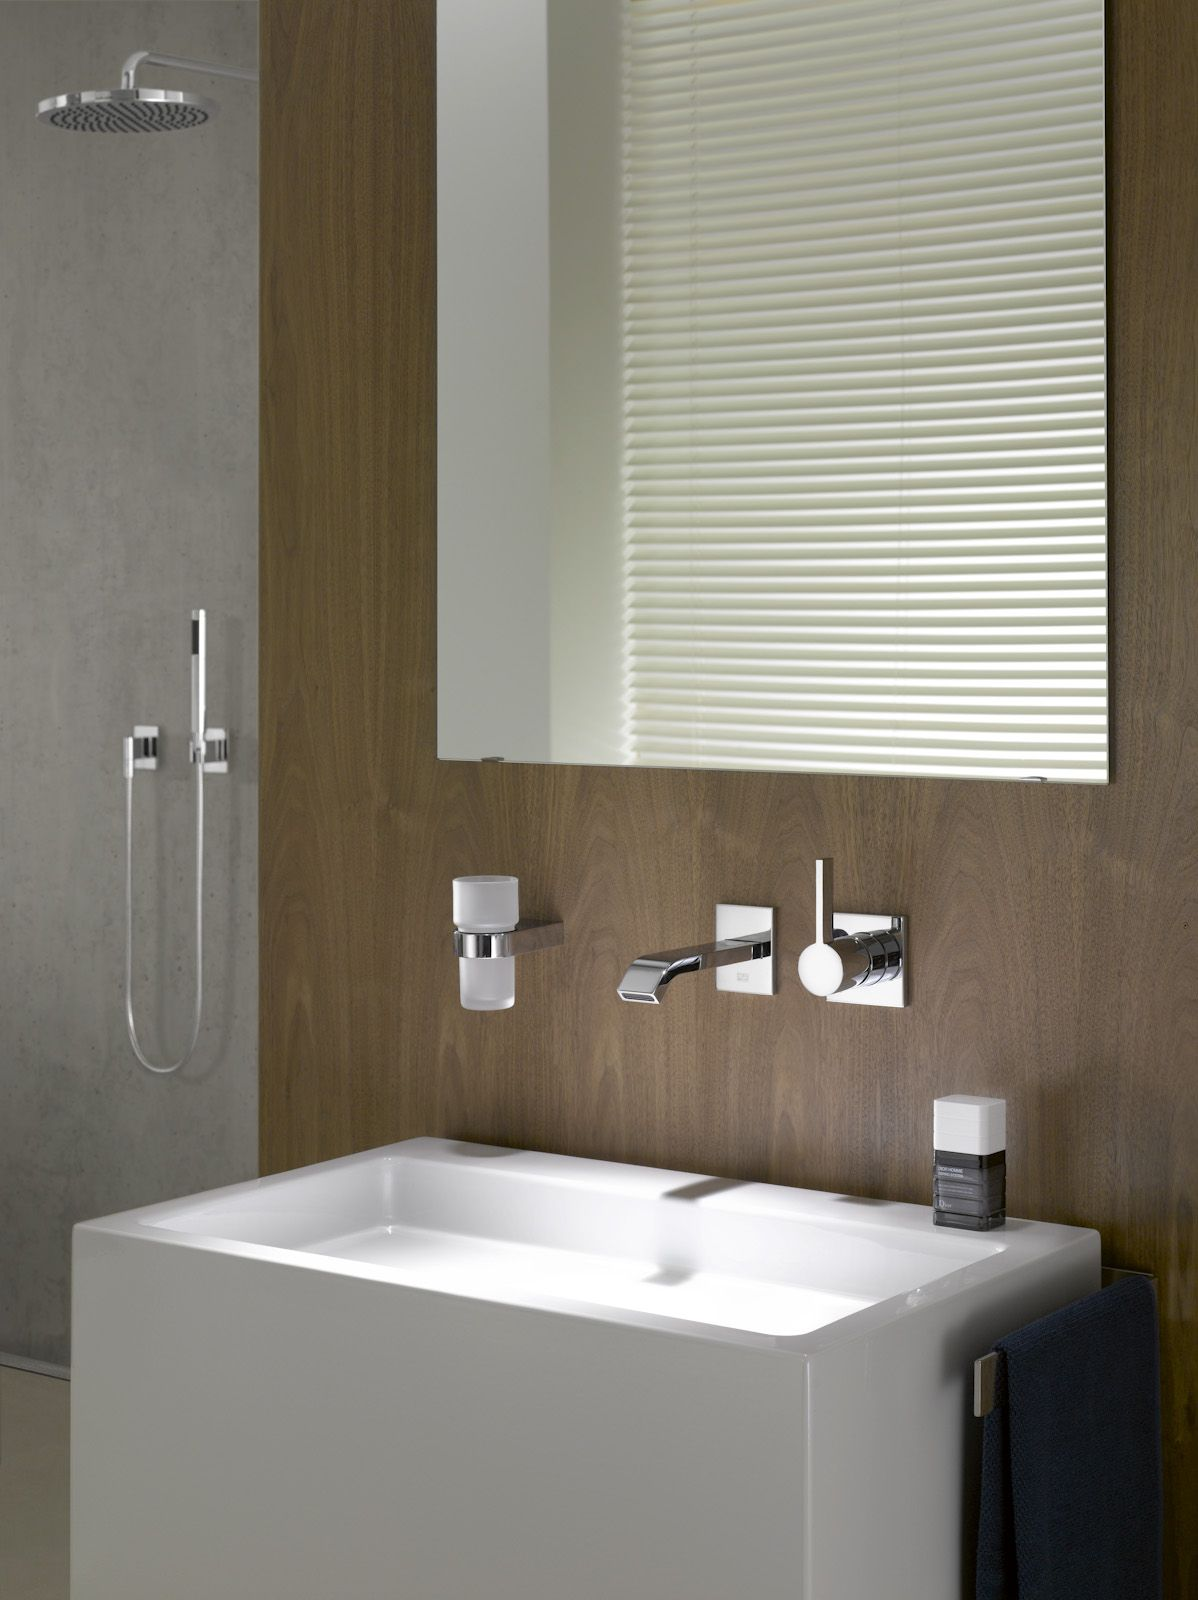 IMO / Bath U0026 Spa / Fitting / Dornbracht